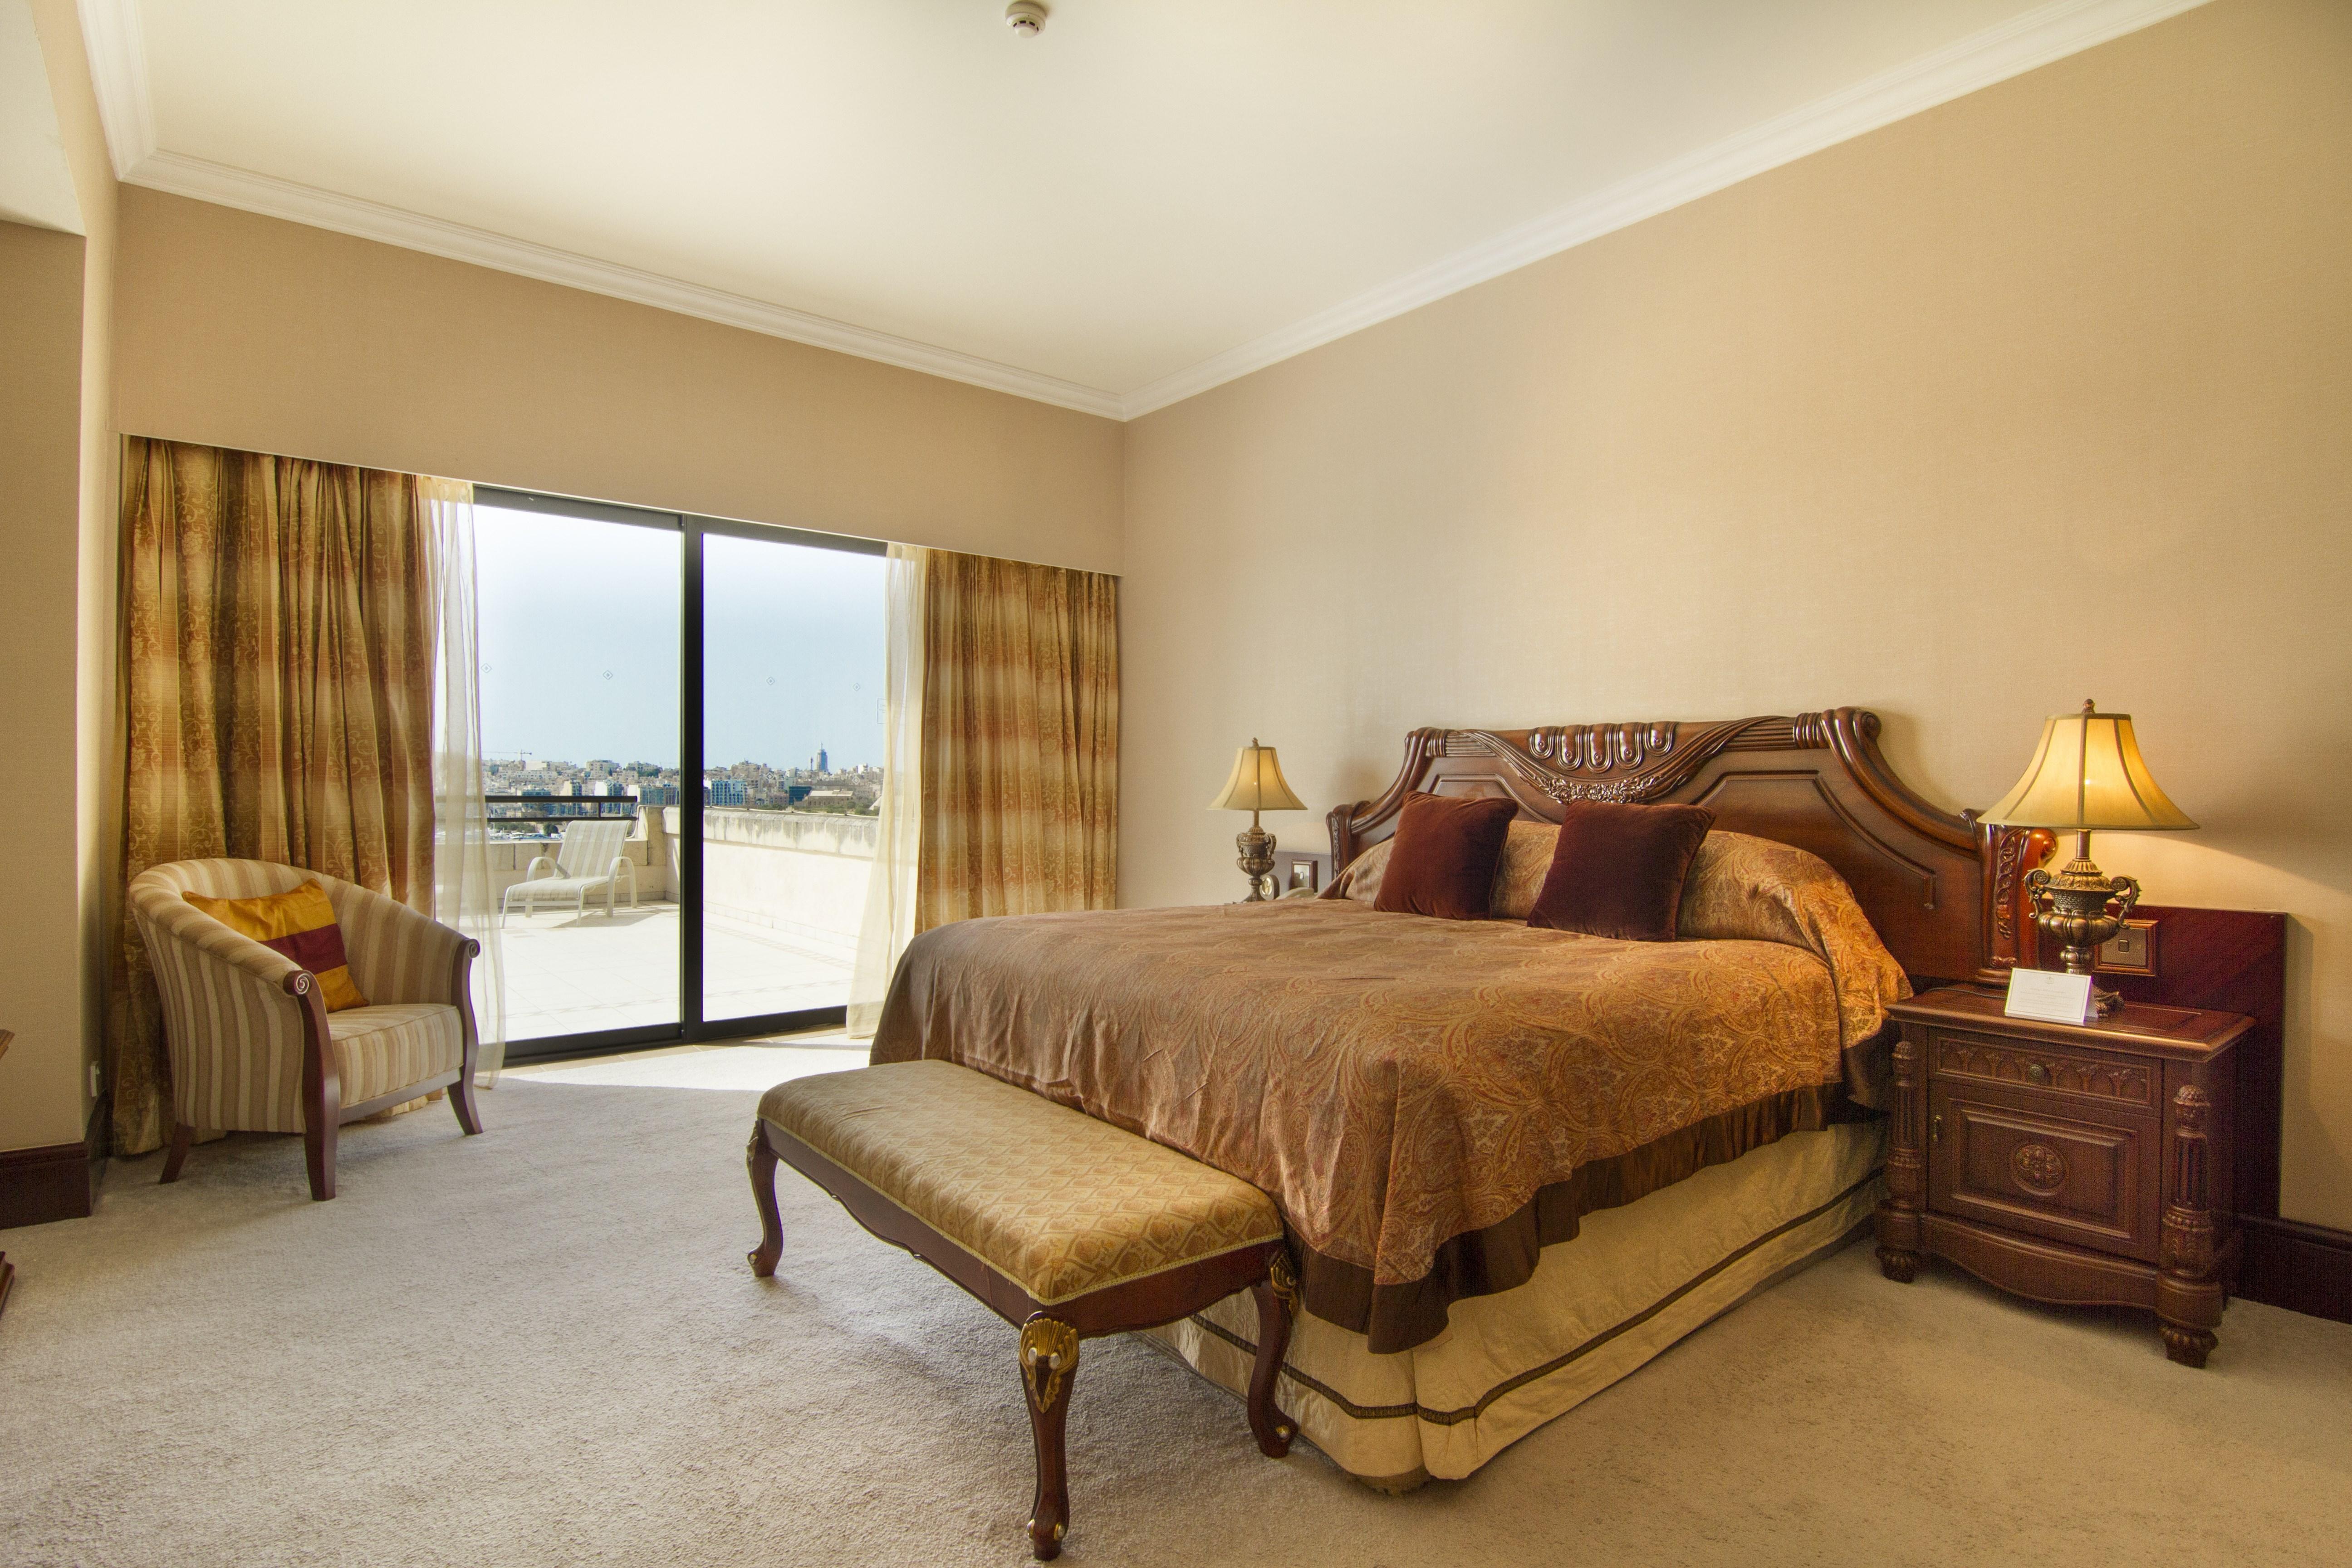 royal-suite-main-bedroom